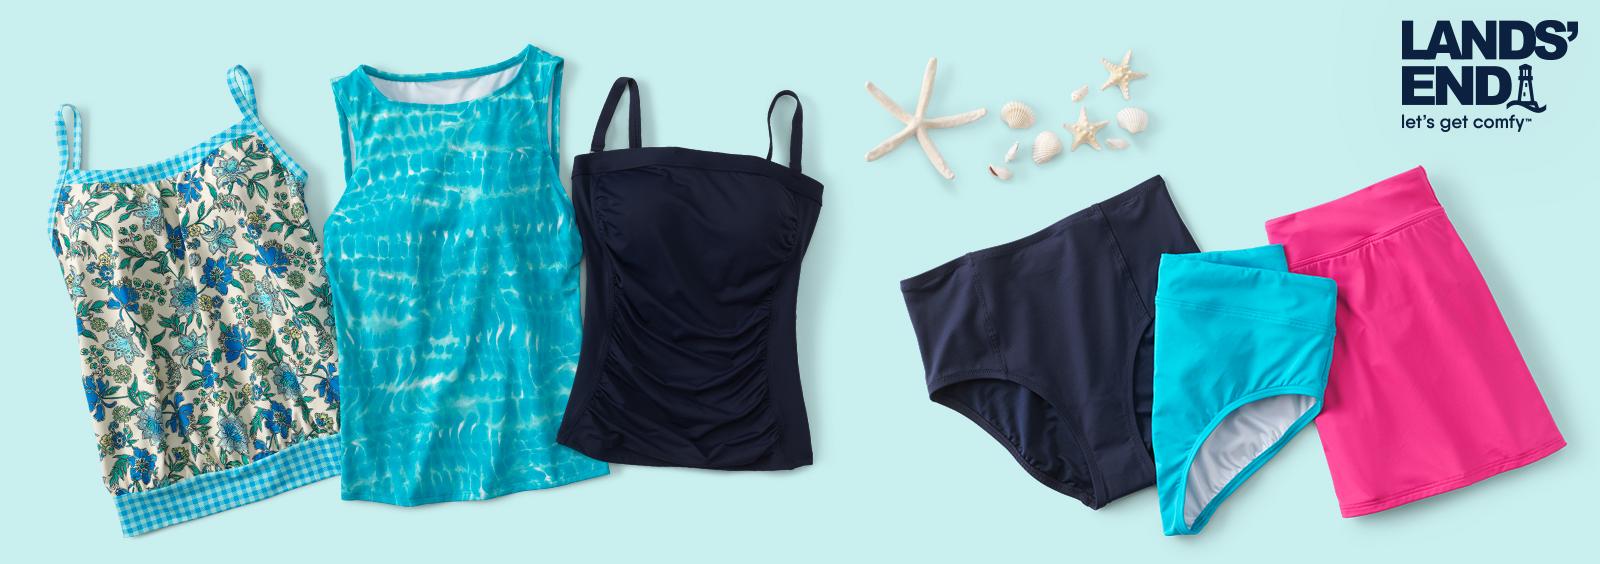 Most Flattering Swimsuits for Seniors